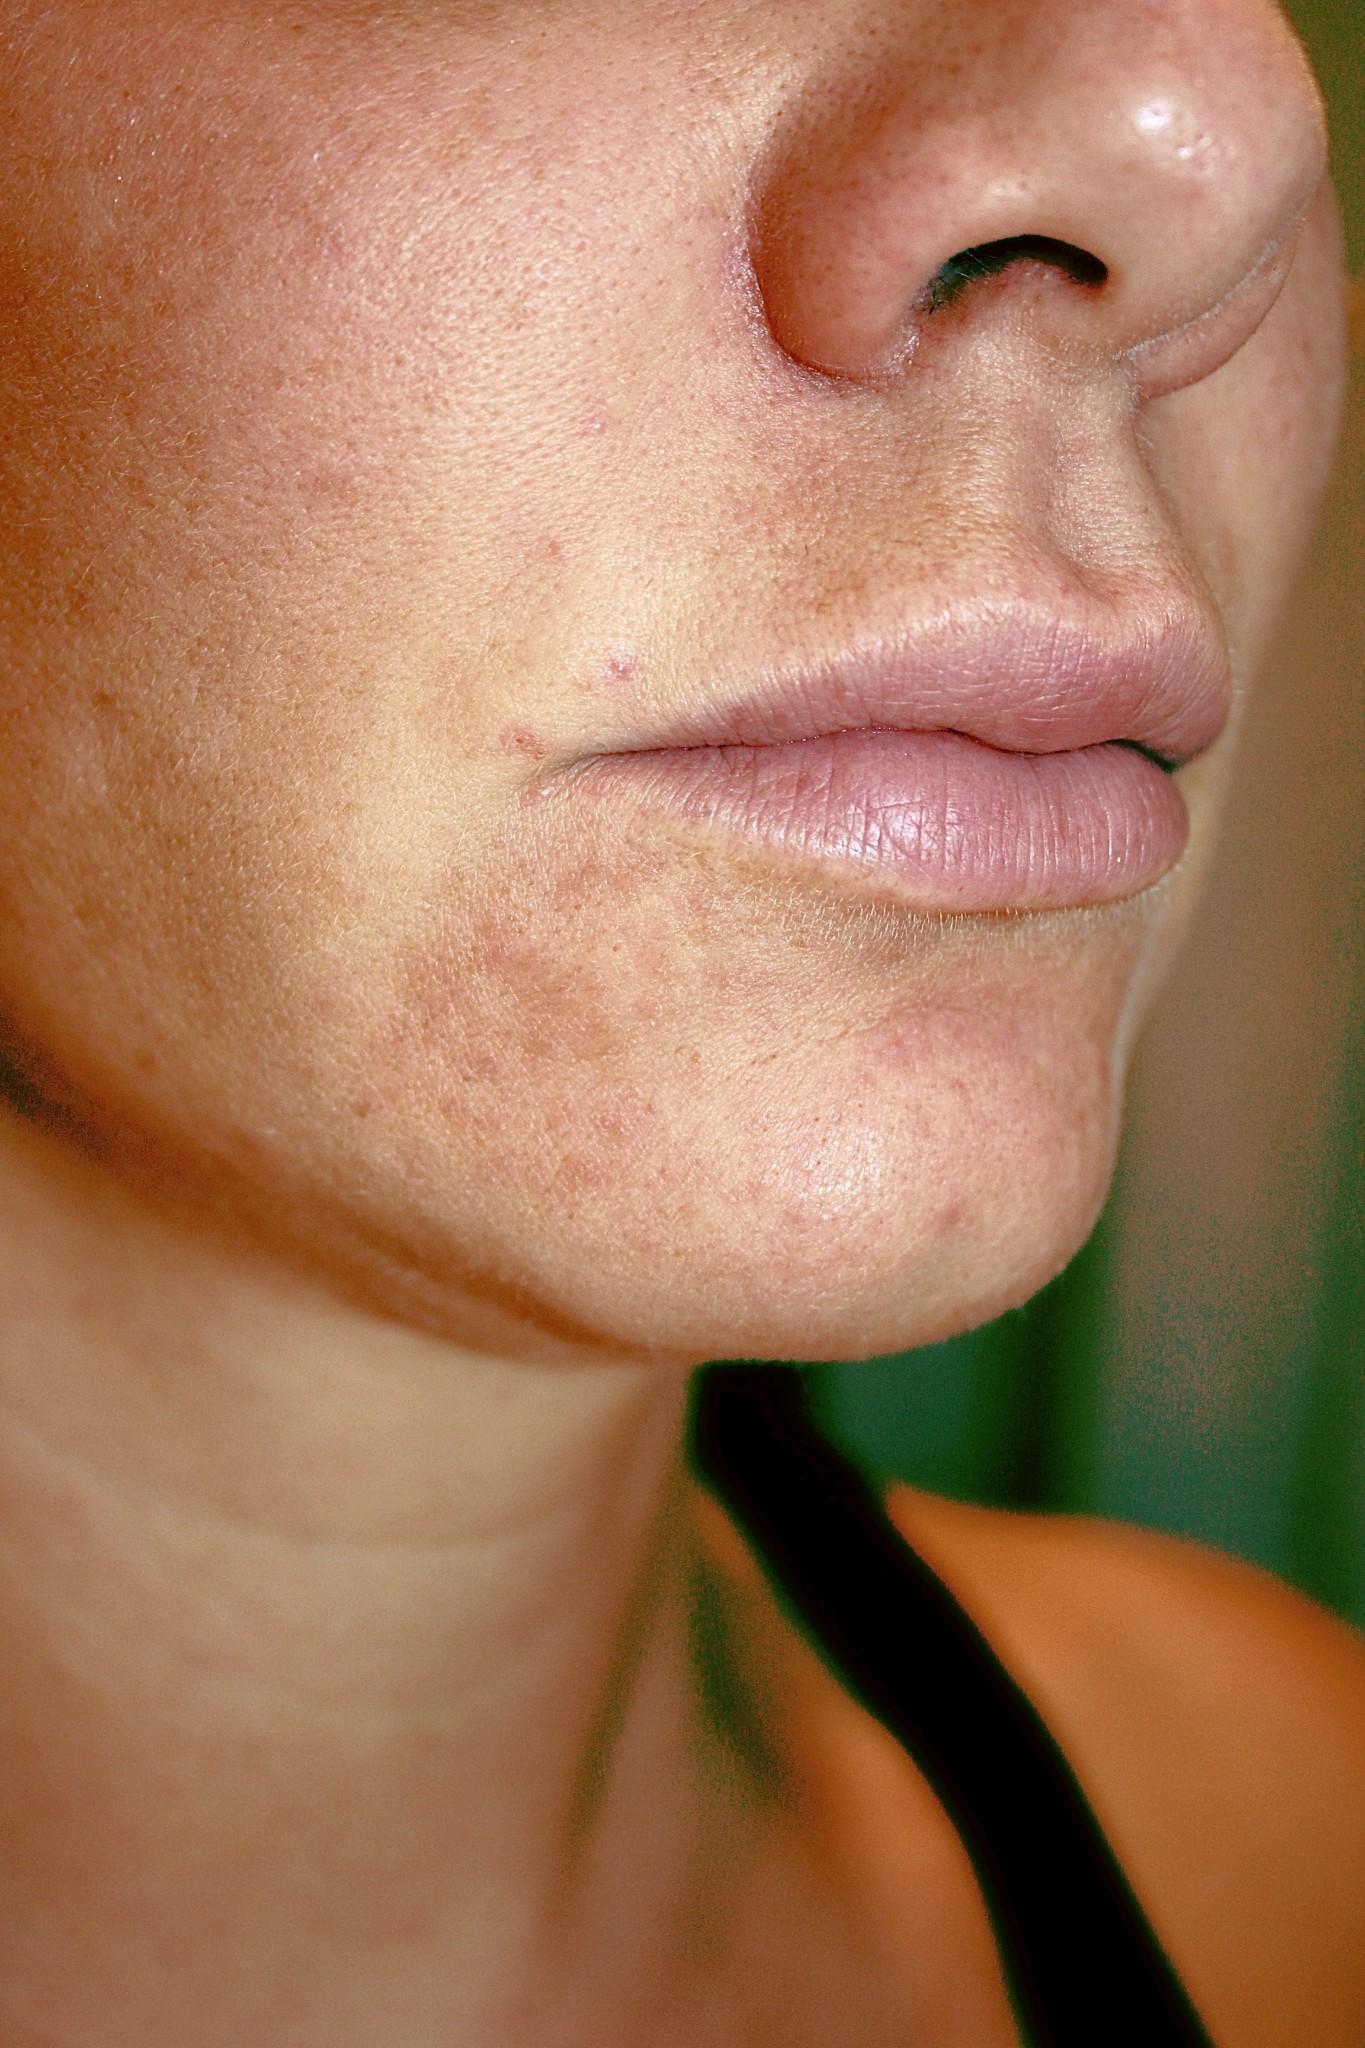 perioral dermatit tetracyklin